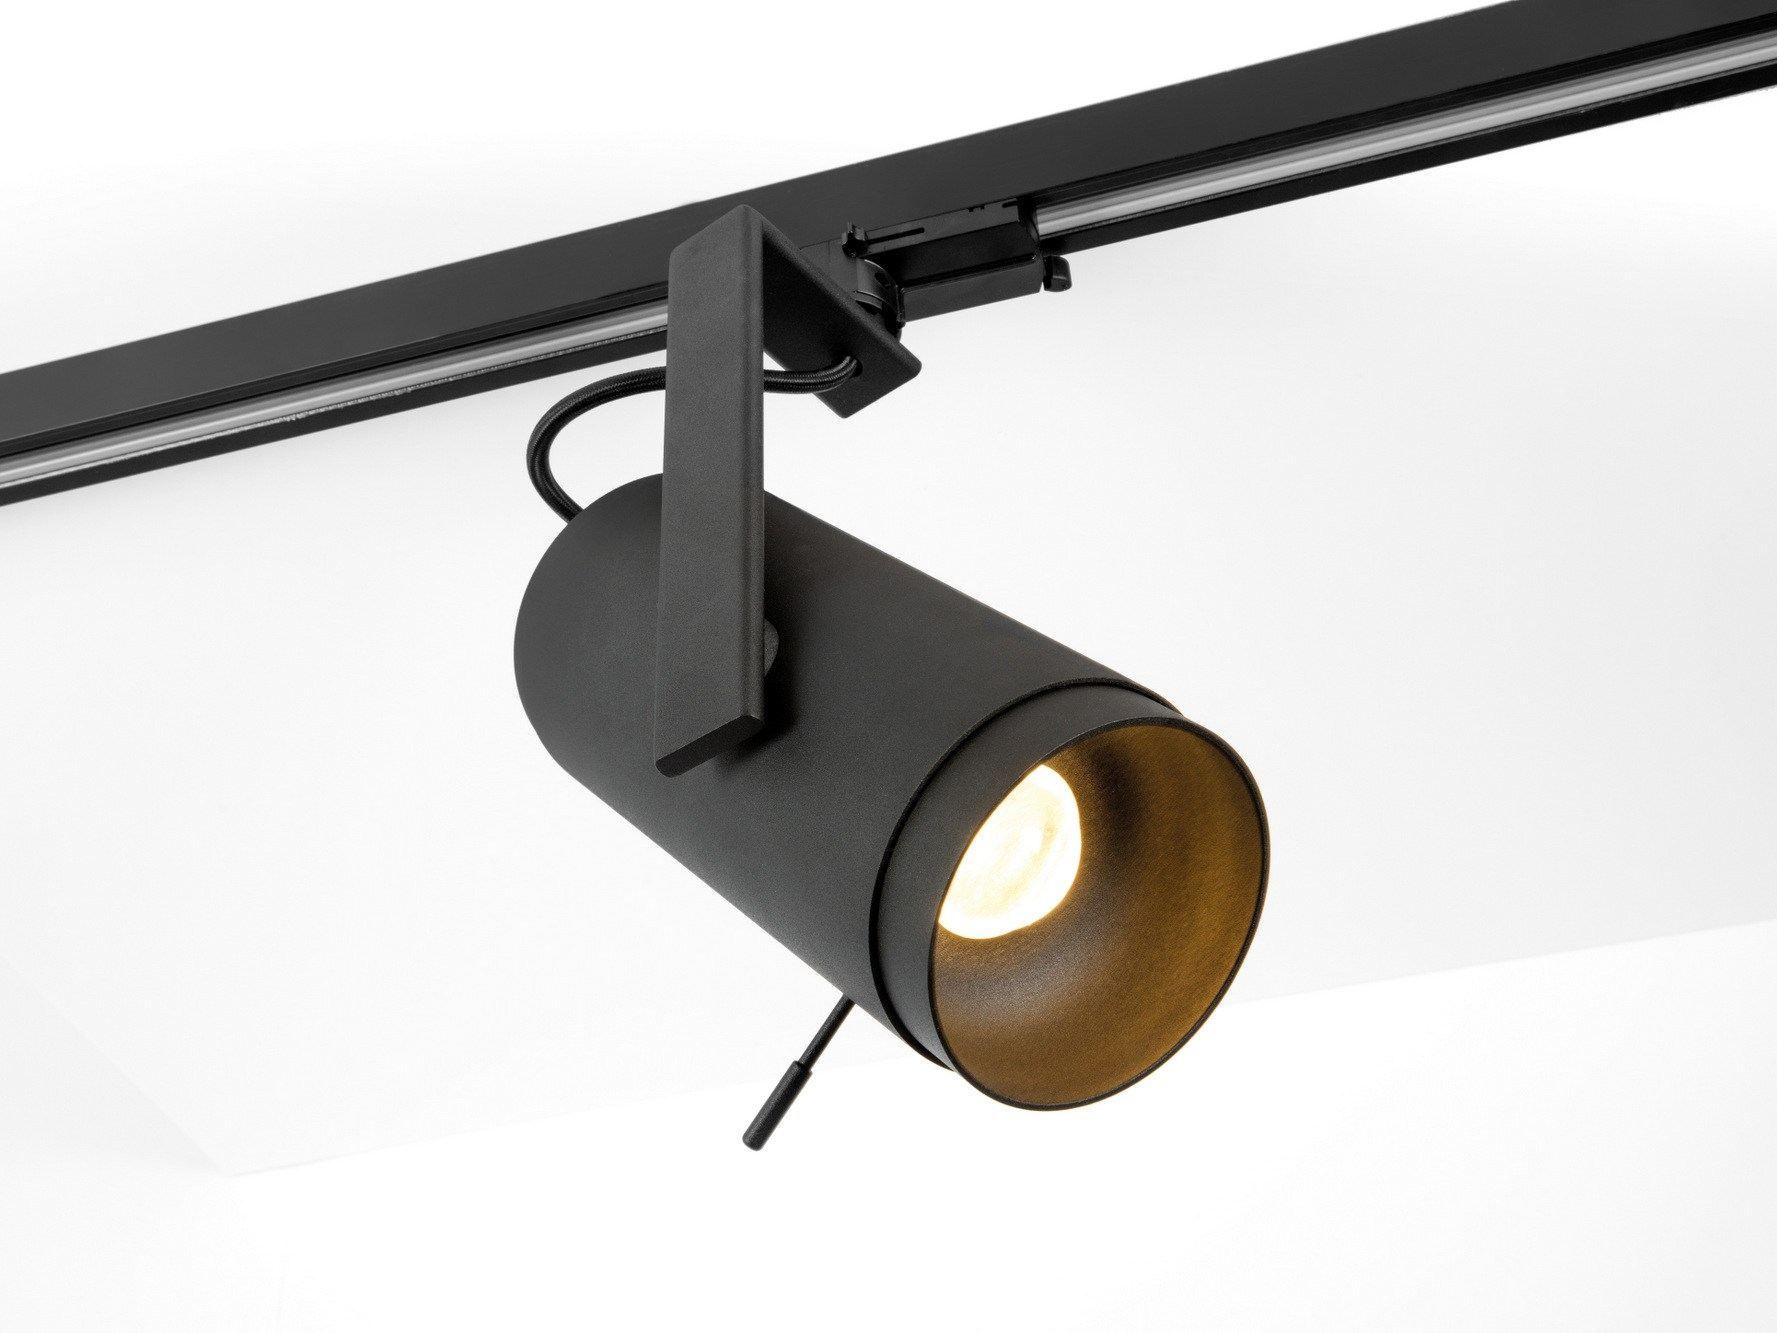 Led adjustable track light spektra by modular lighting for Interior design track lighting